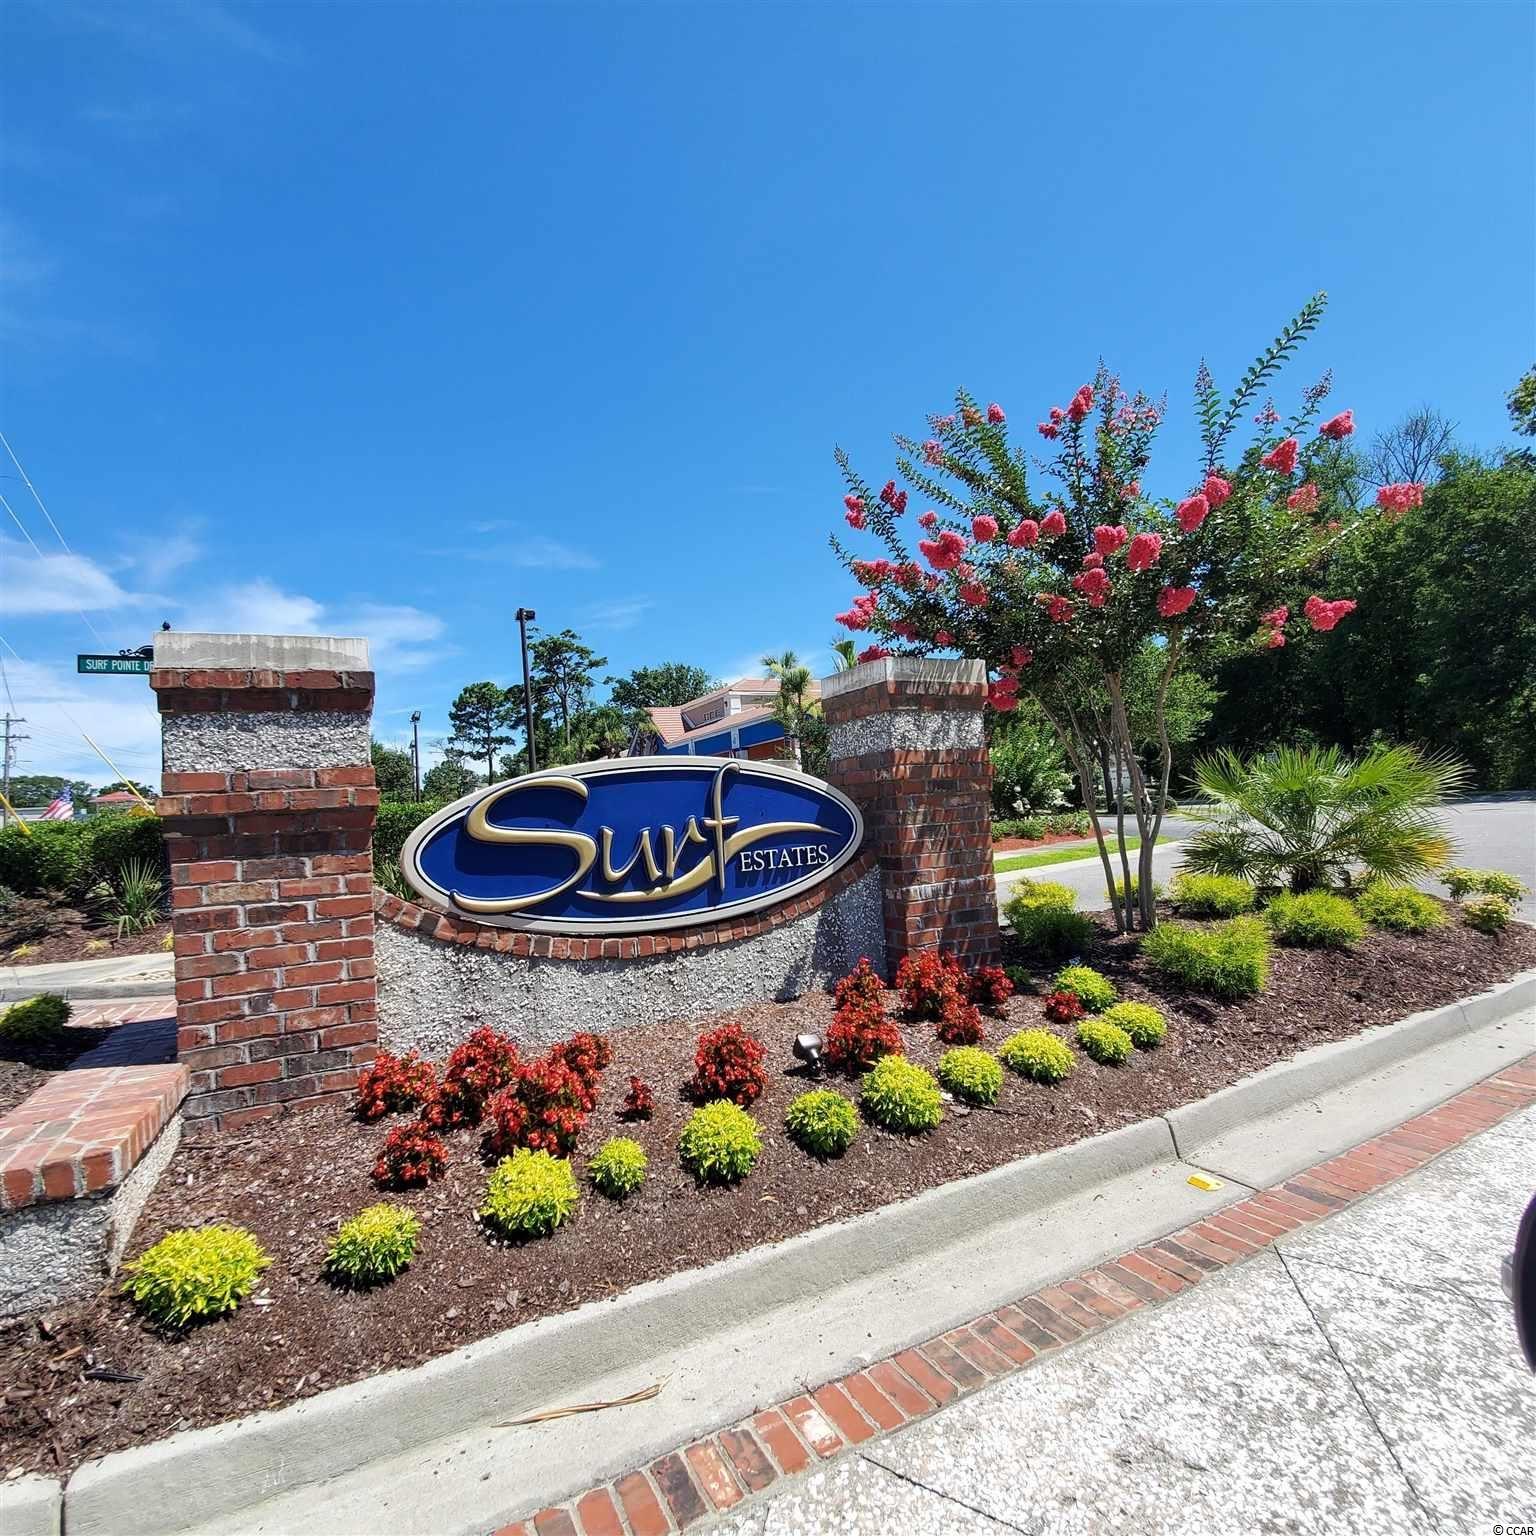 1302 Surf Pointe Dr., North Myrtle Beach, SC, 29582, Surf Estates NMB Home For Sale